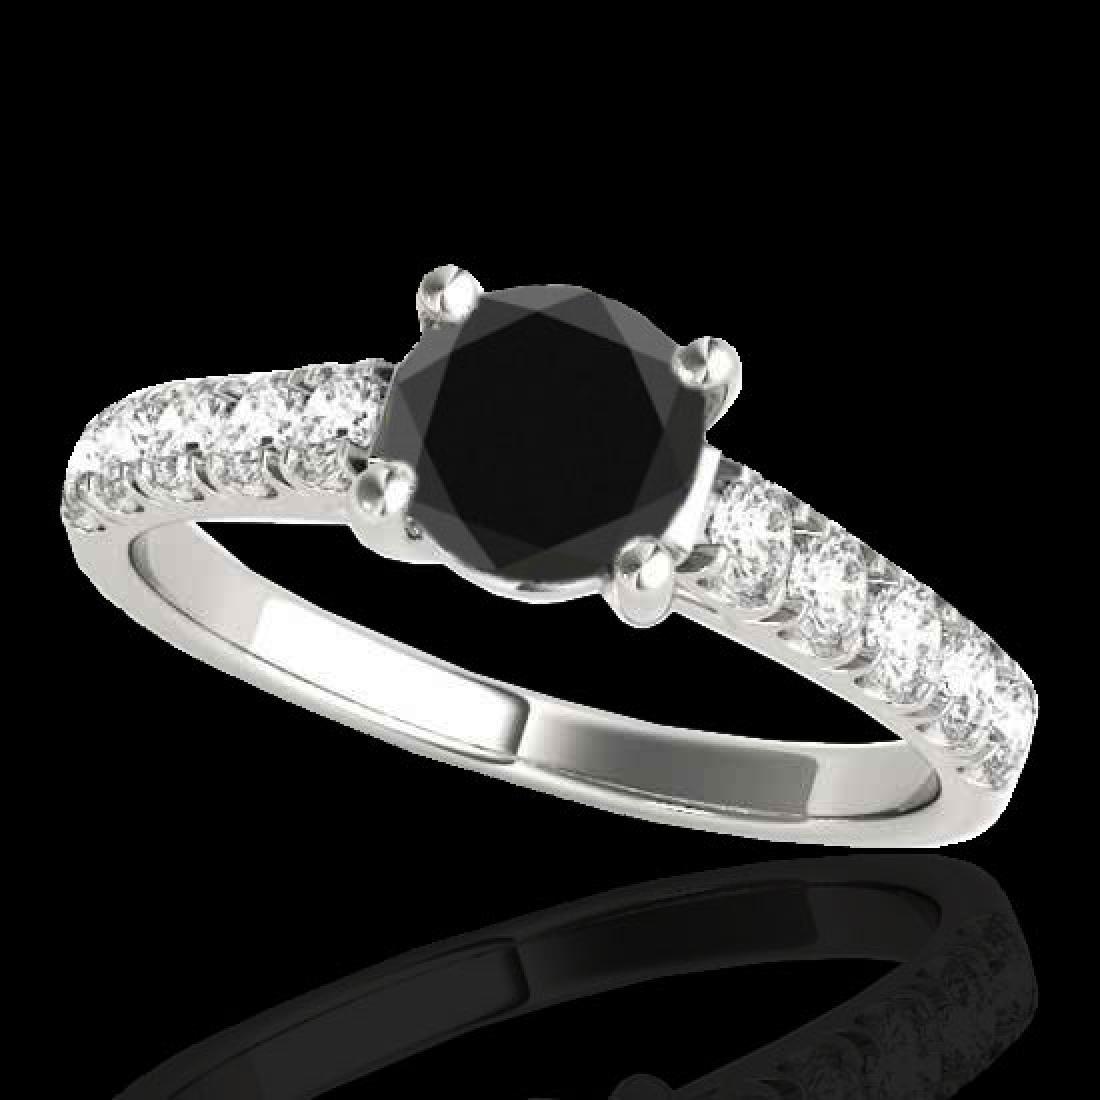 2.1 CTW Certified VS Black Diamond Solitaire Ring 10K